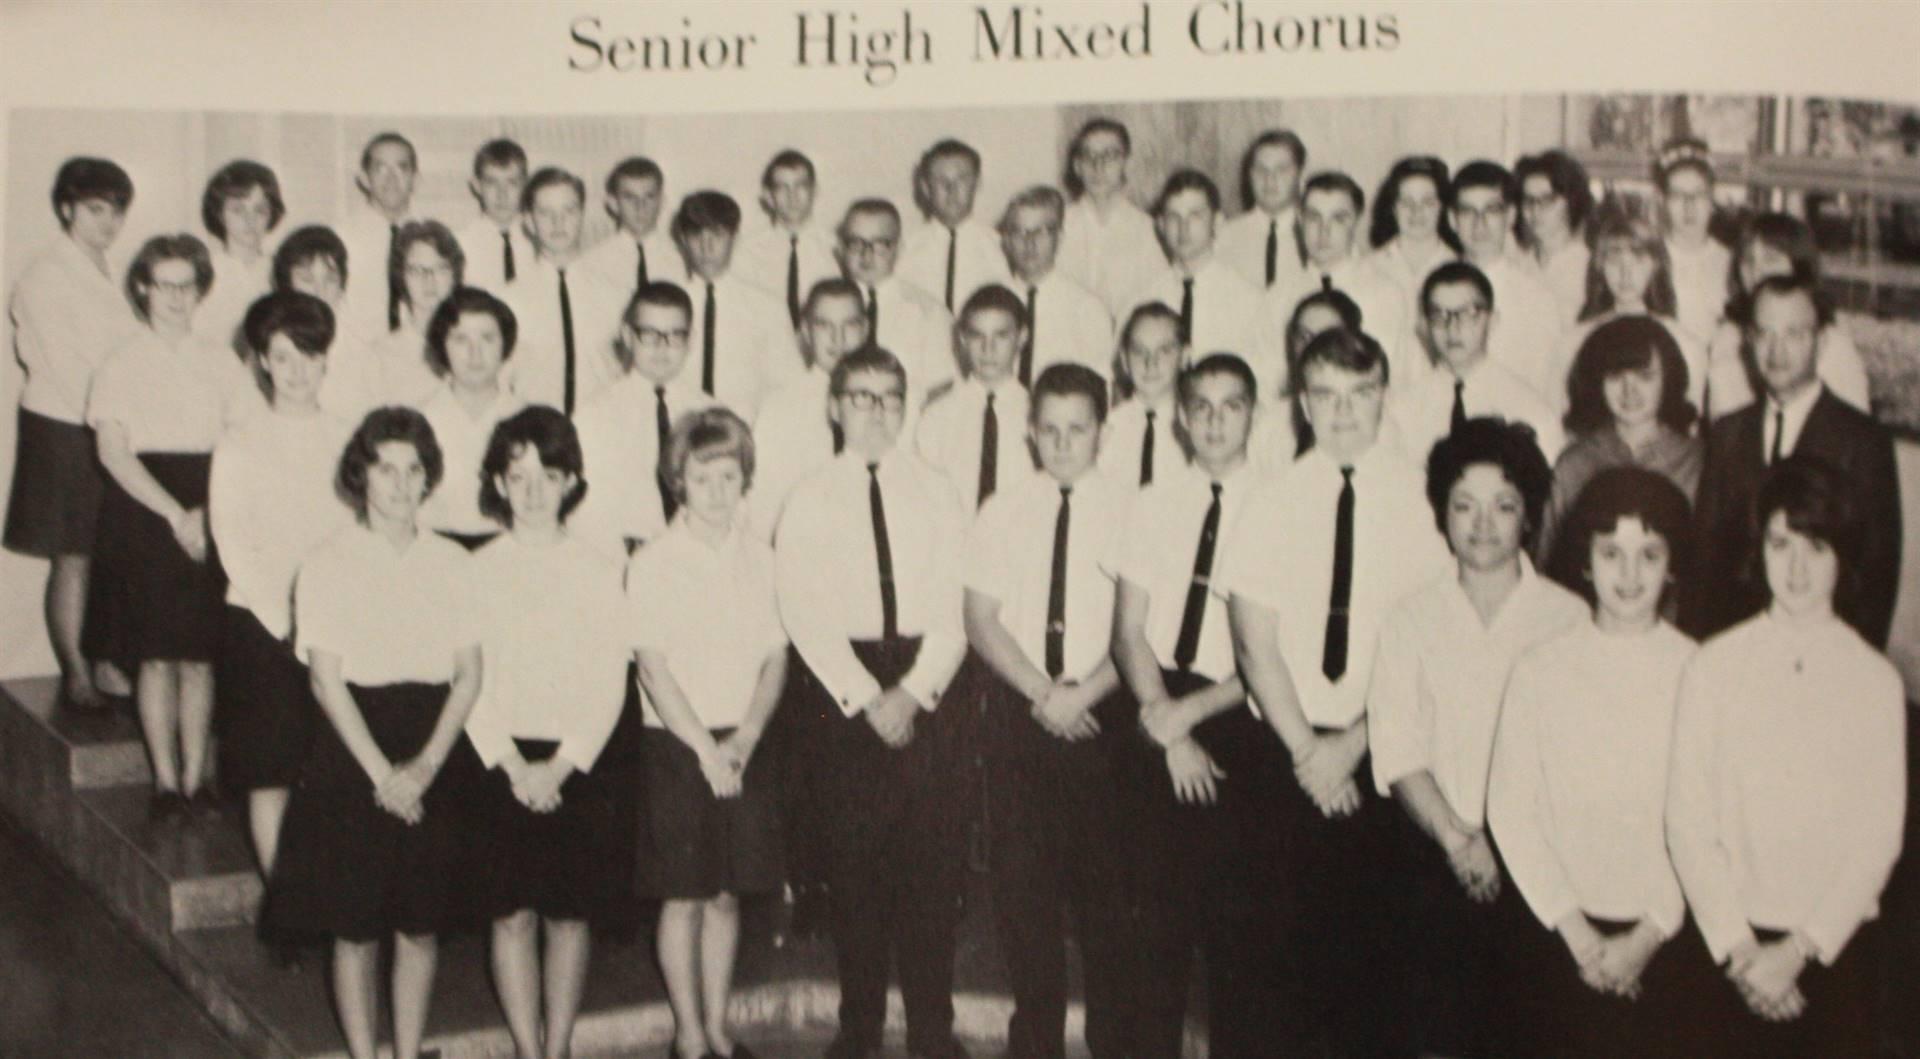 1966 Senior High Mixed Chorus